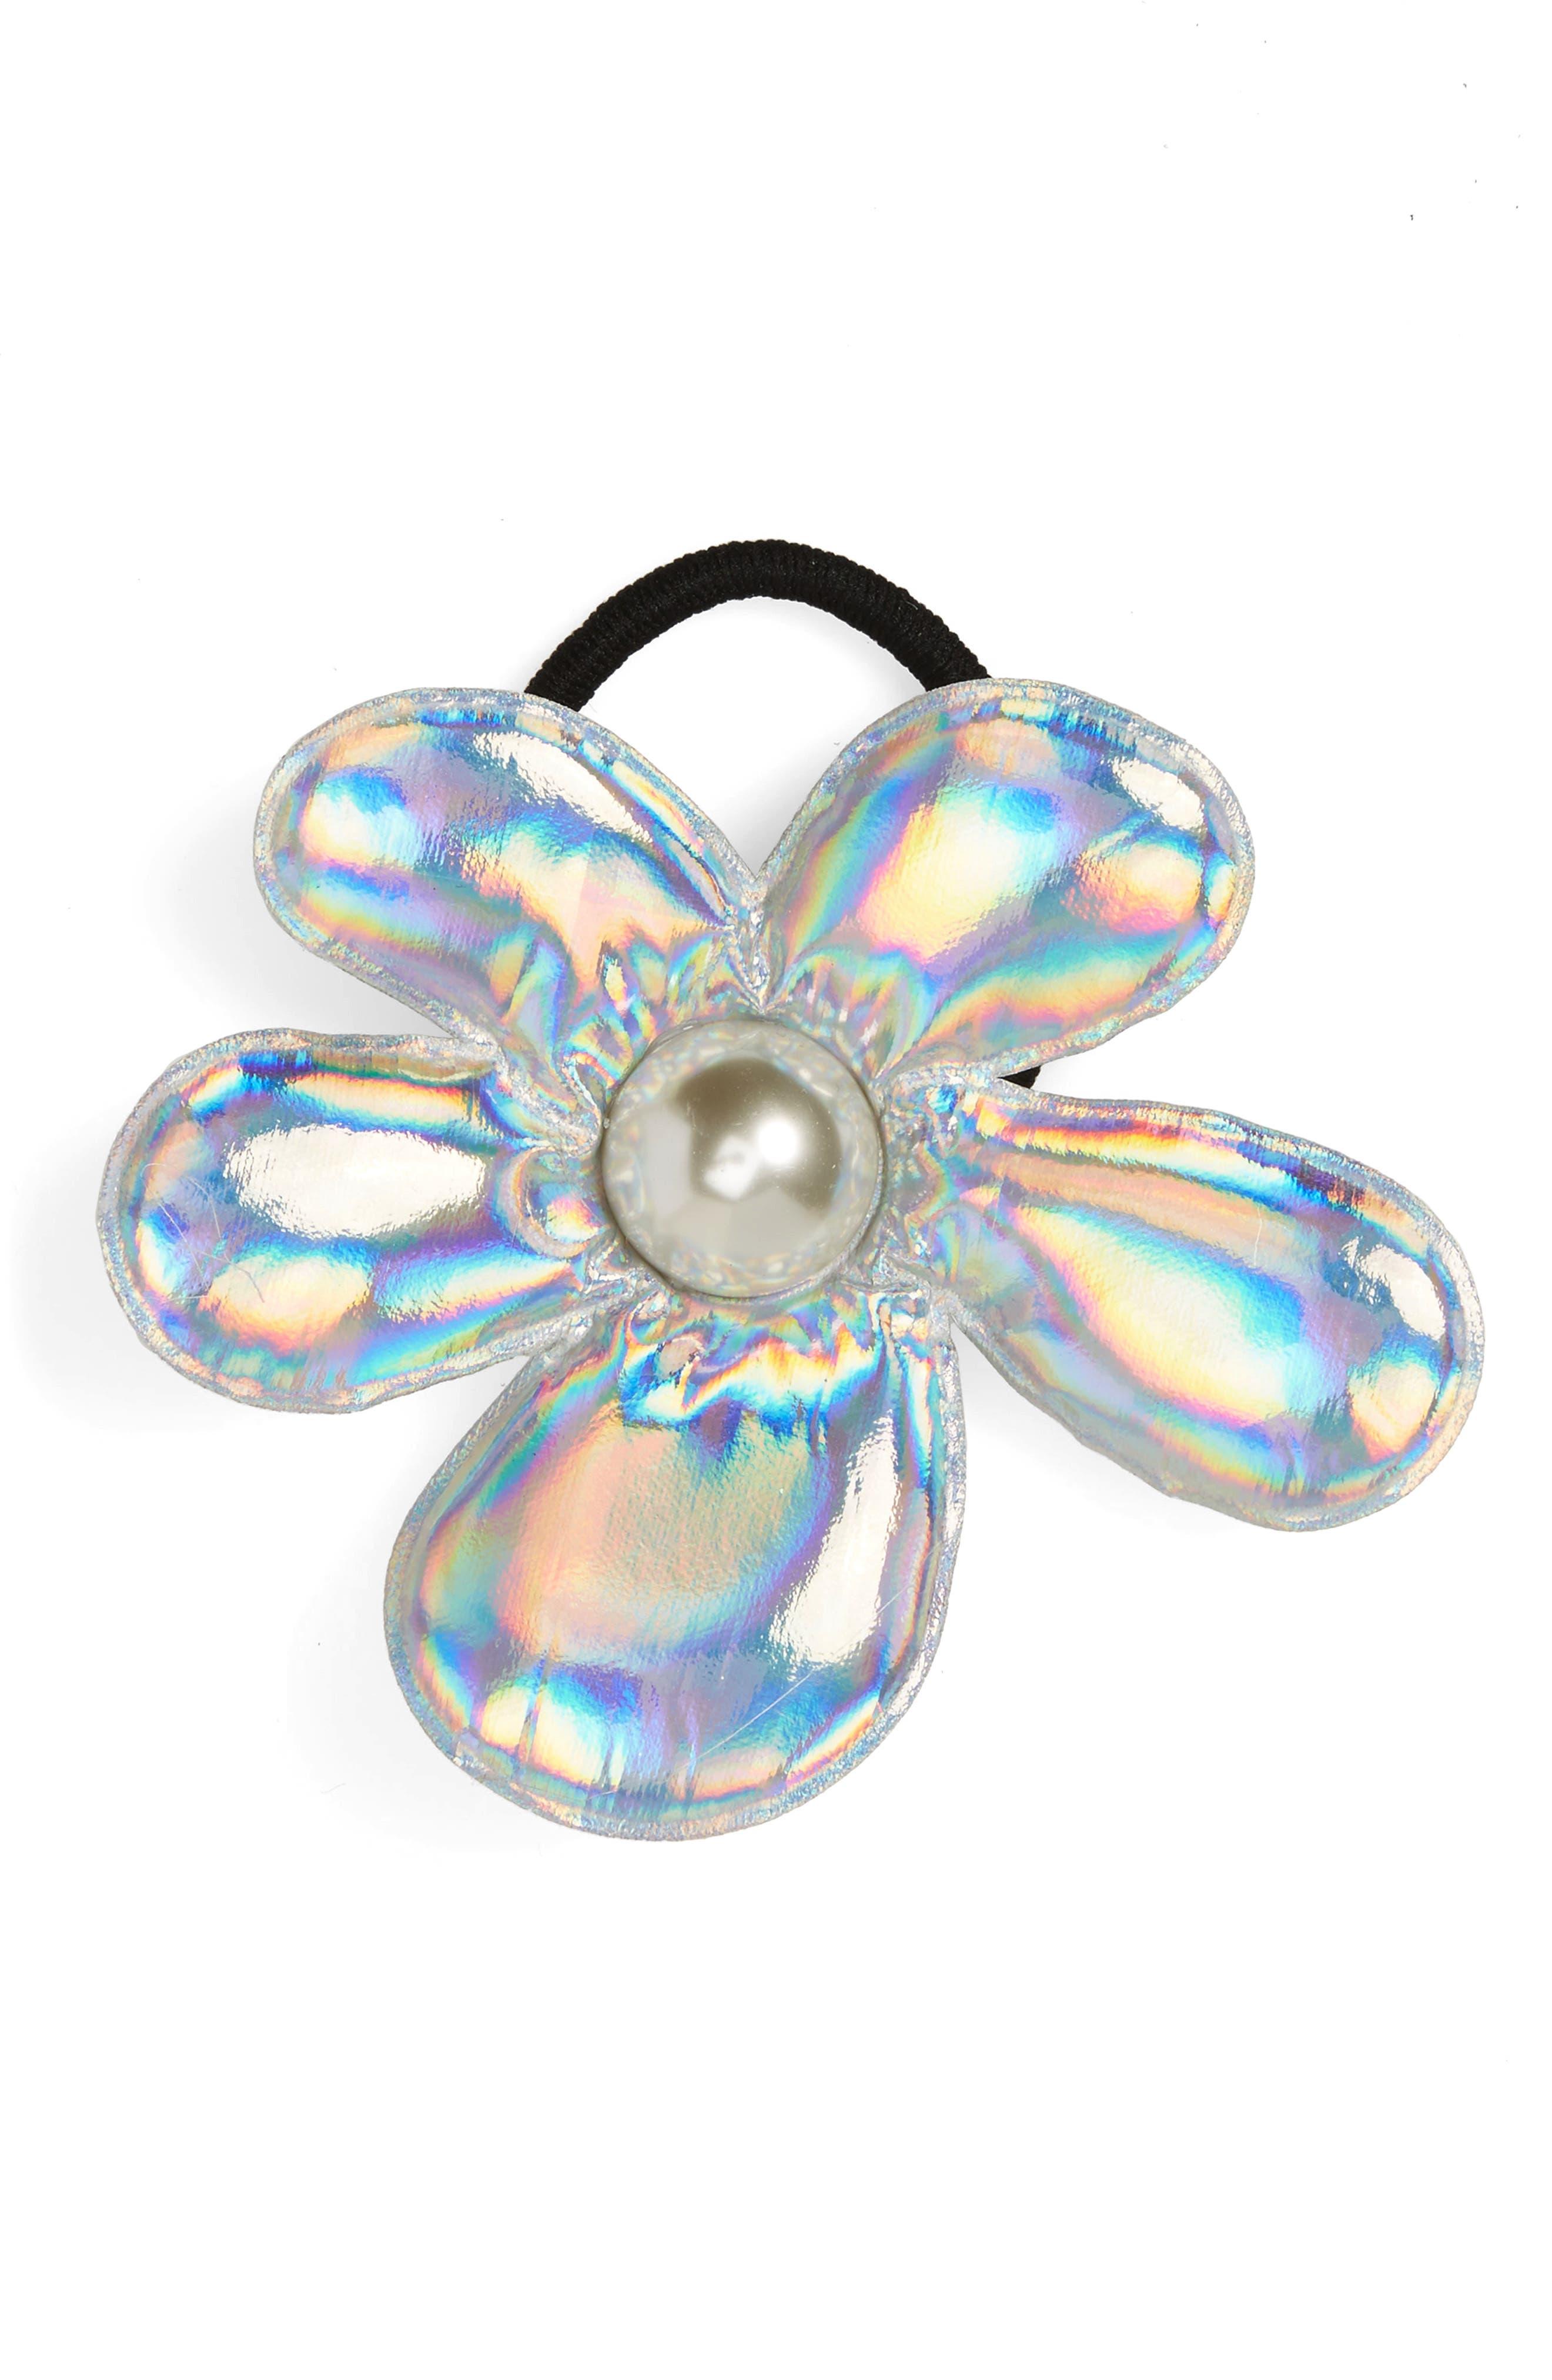 Iridescent Flower Ponytail Holder,                             Main thumbnail 1, color,                             044